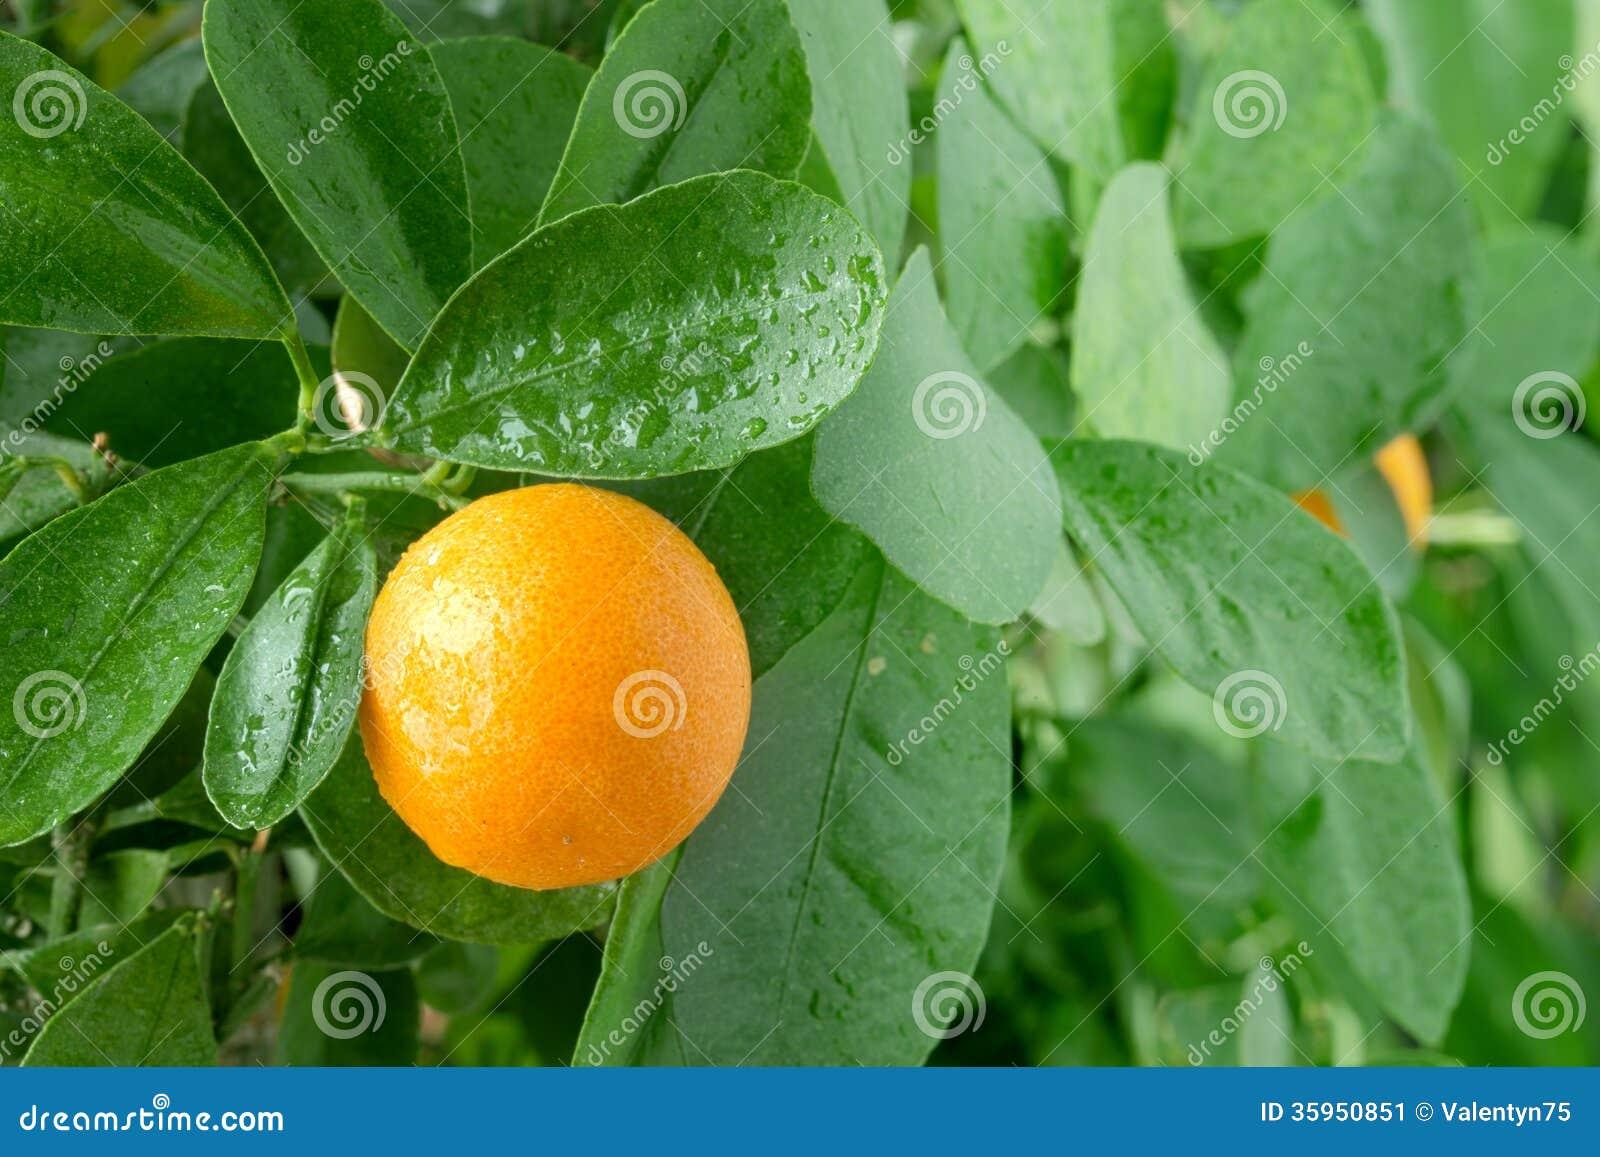 Tangerine on a citrus tree.